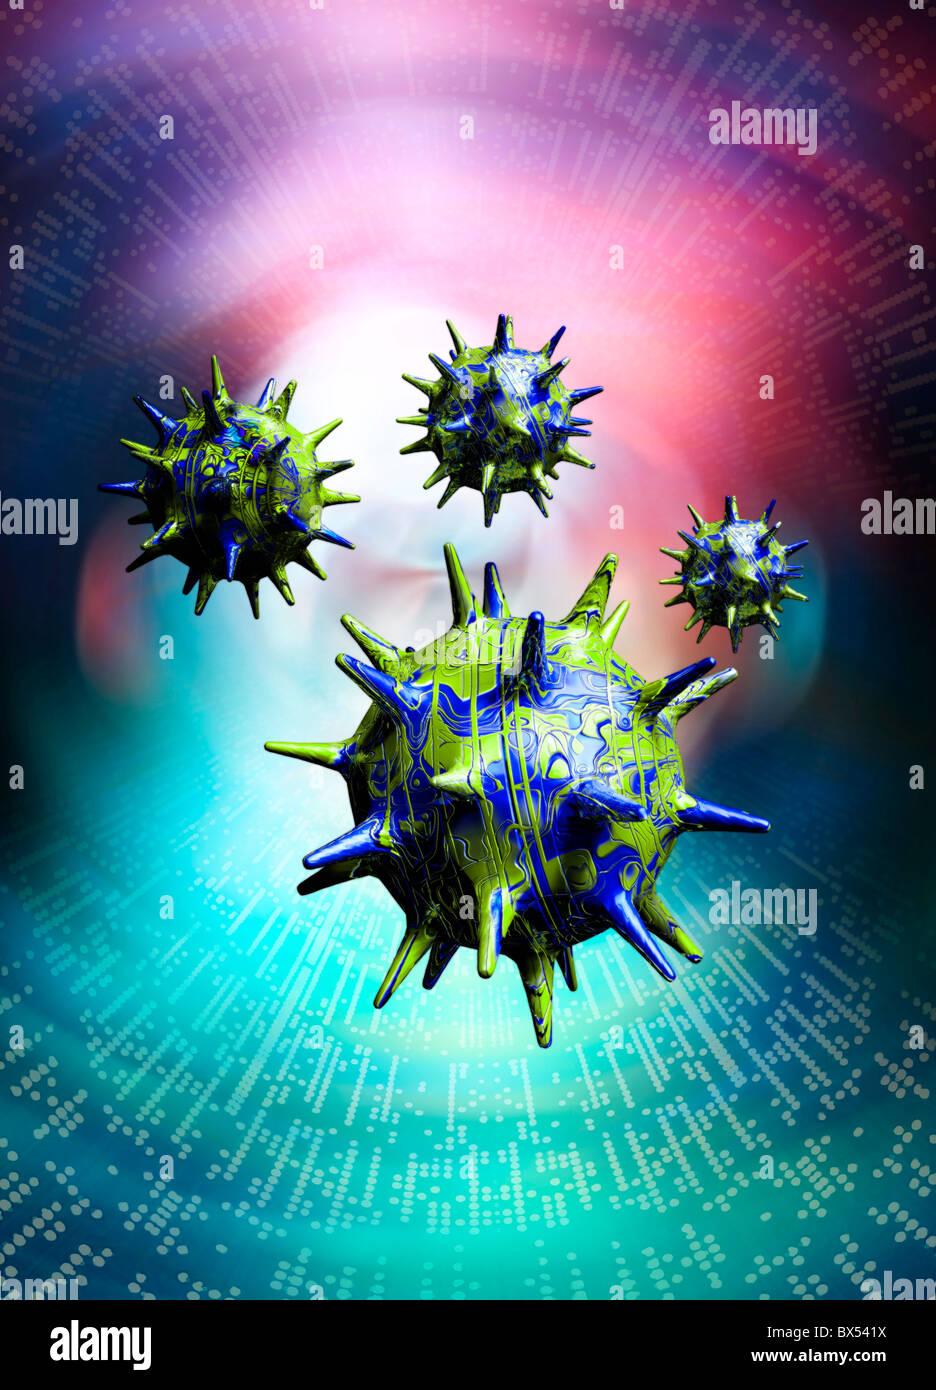 Computer-Virus, konzeptuellen Kunstwerk Stockbild